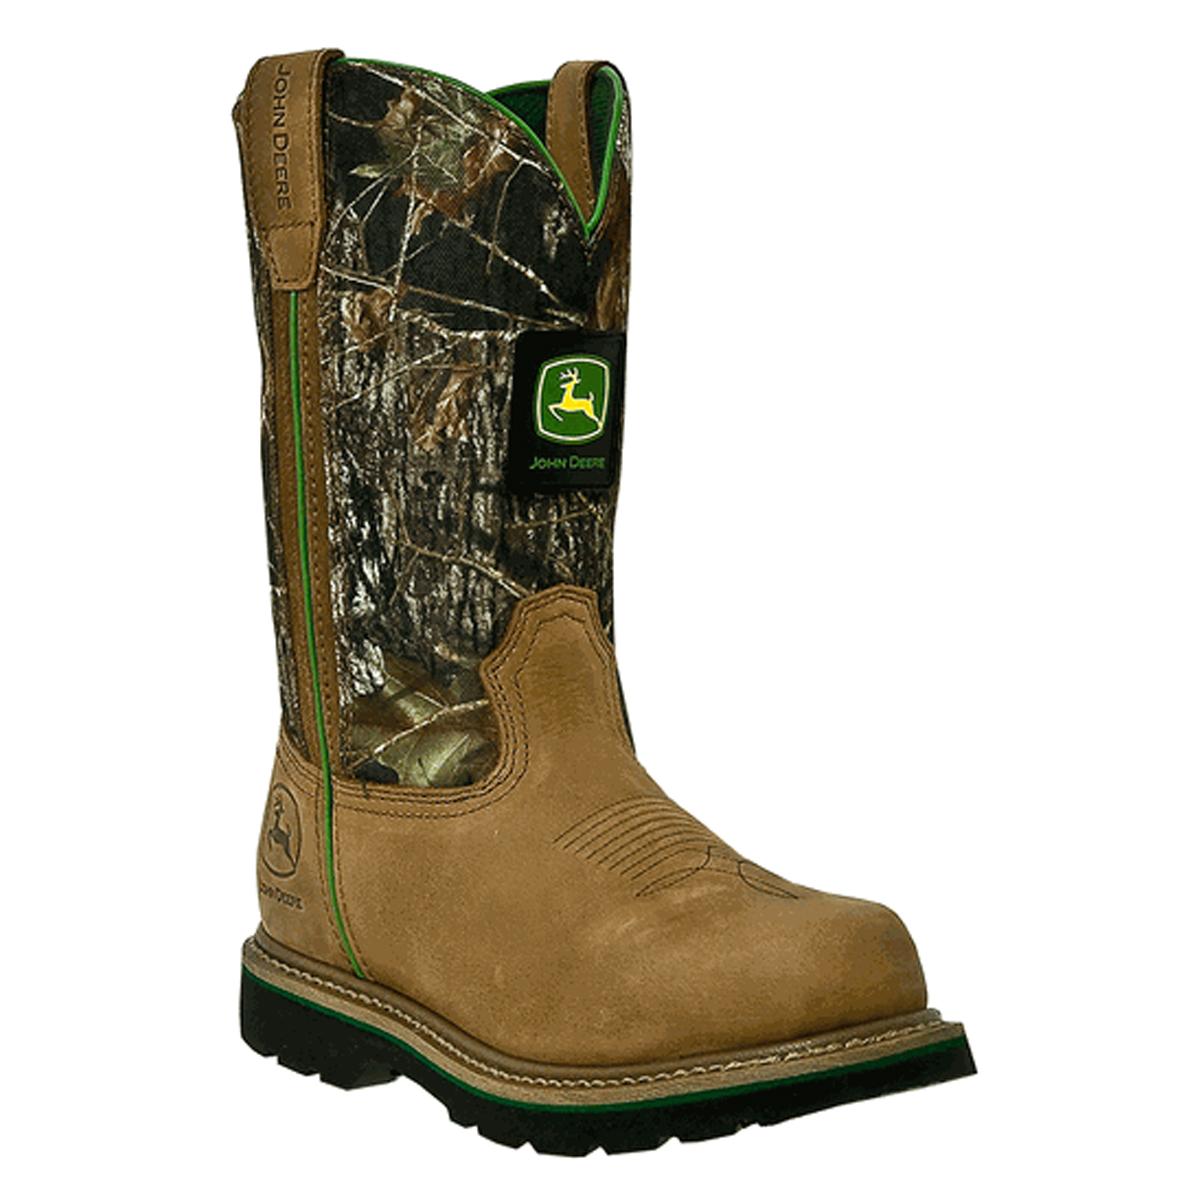 ... about John Deere Men's Tan and Camo Wellington Work Boots JD4148